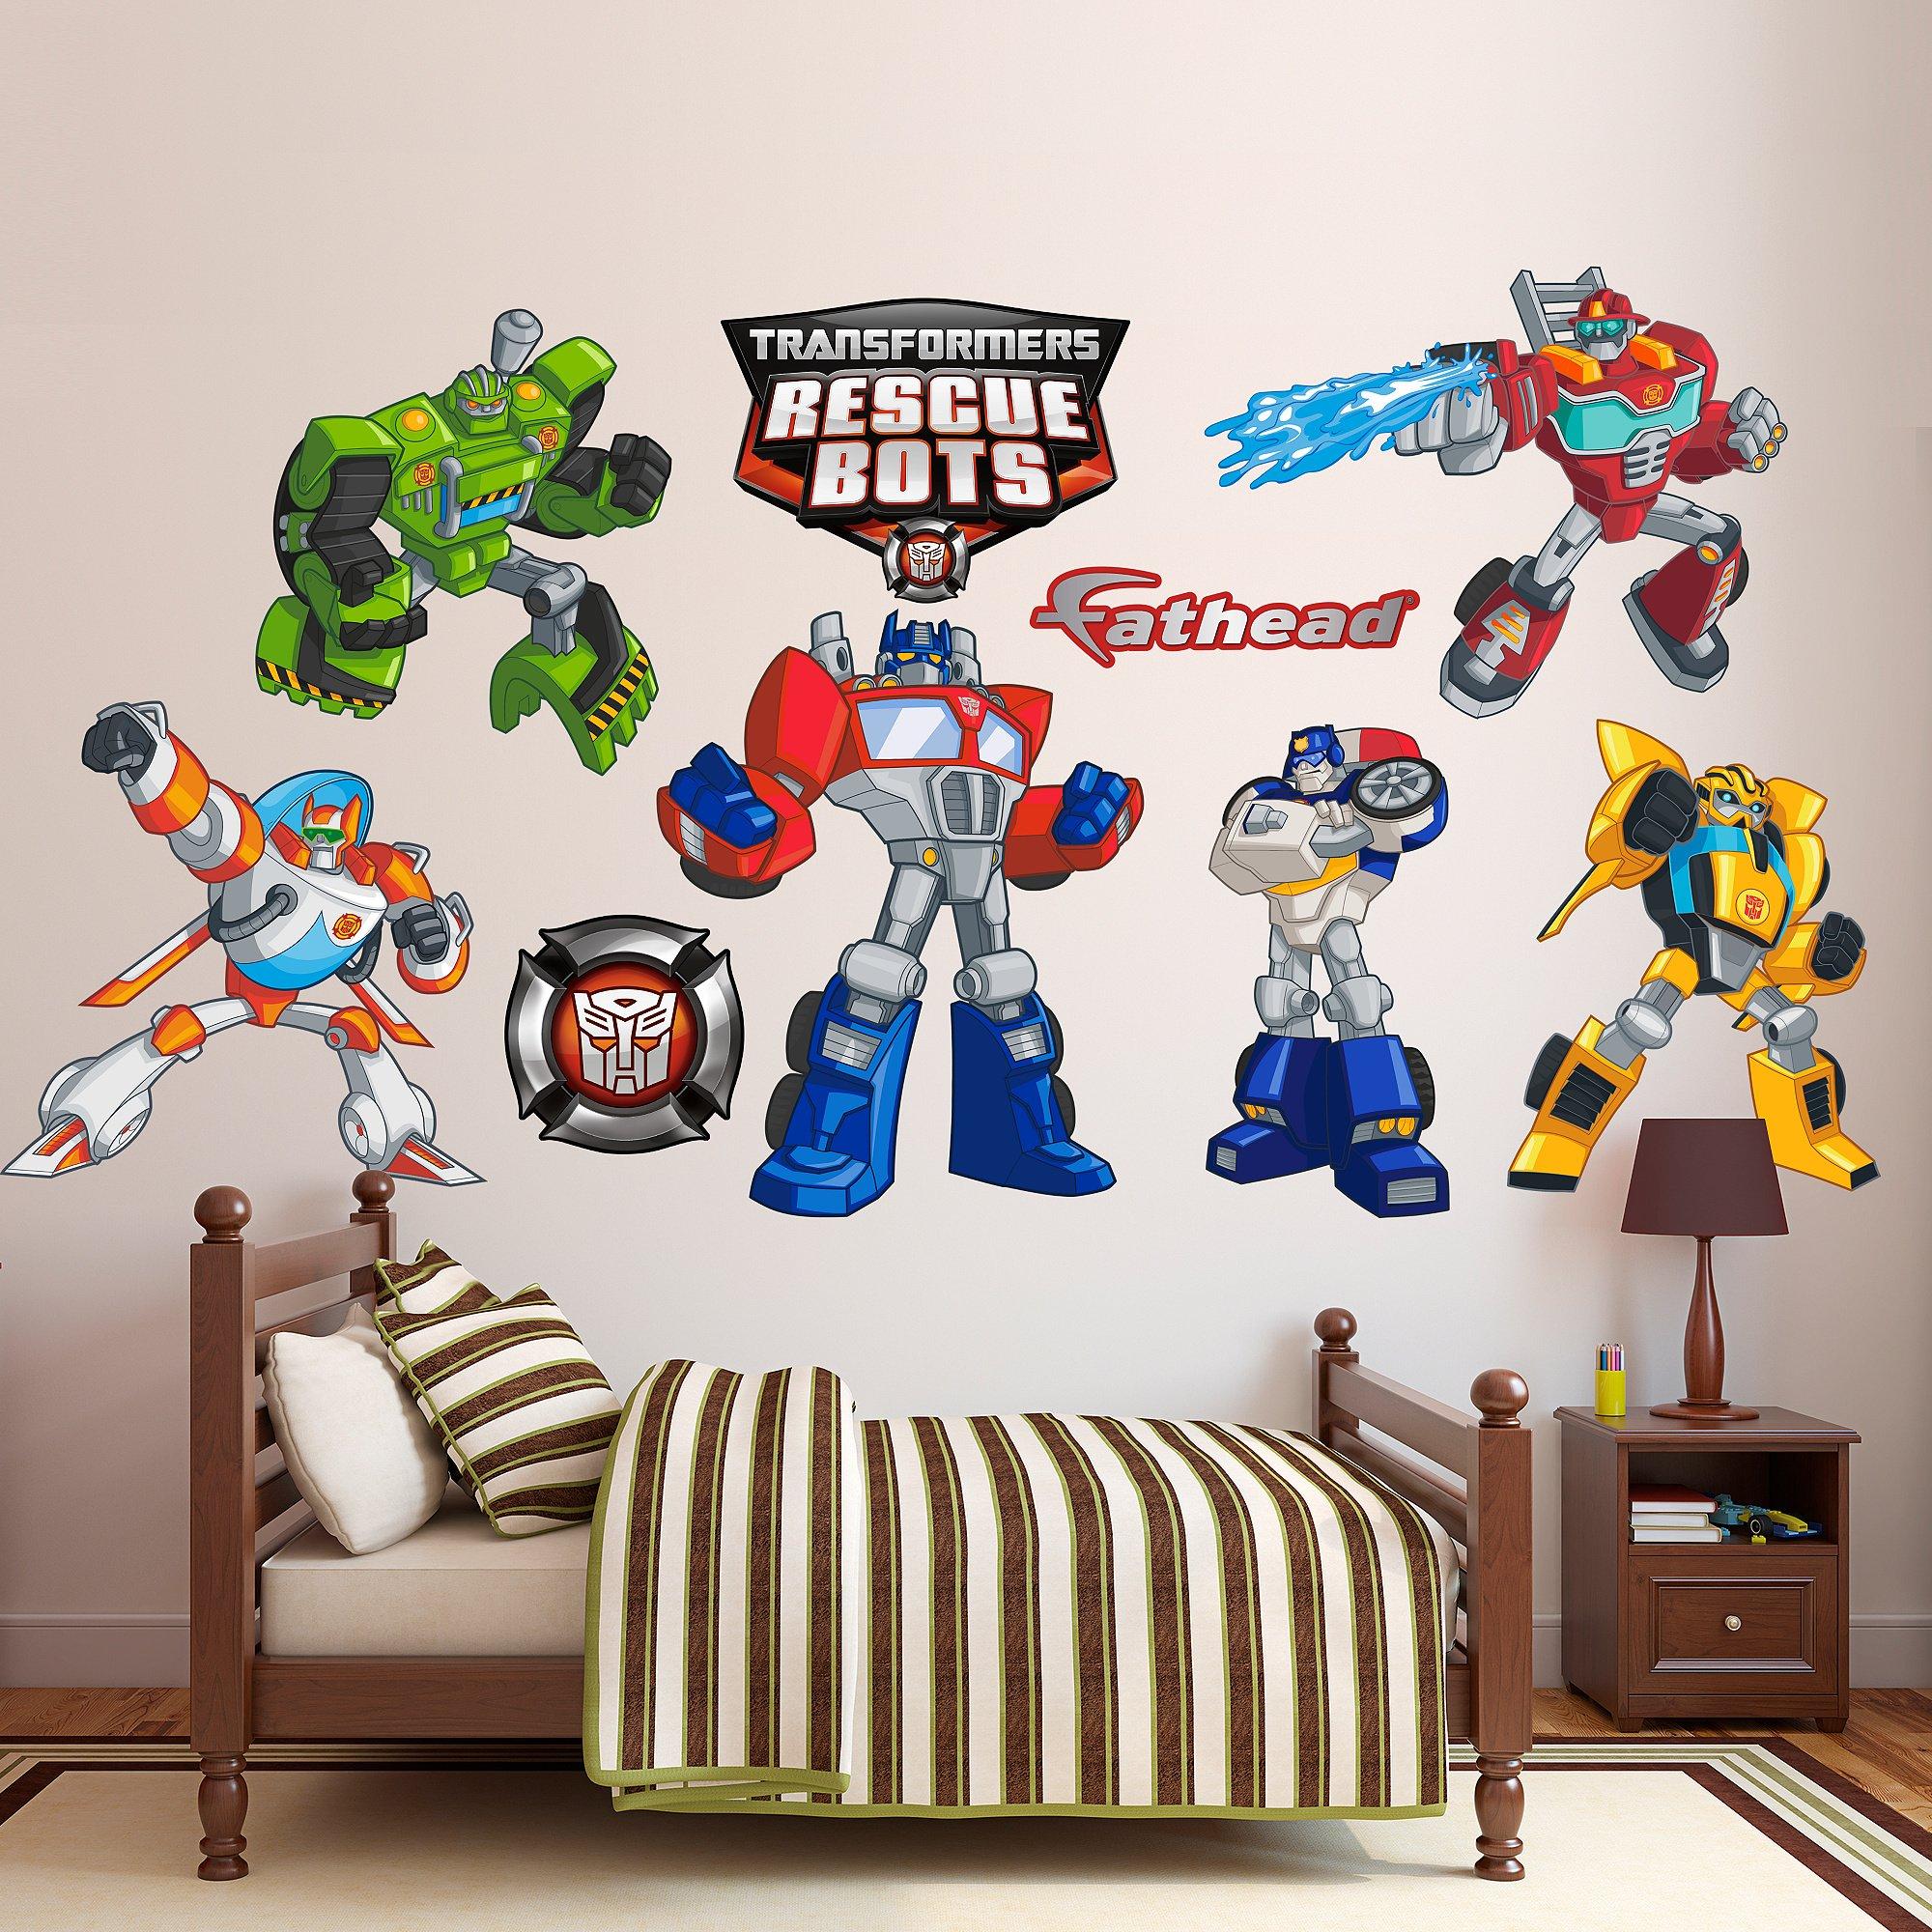 Fathead Transformers Rescue Bots Collection Vinyl Decals